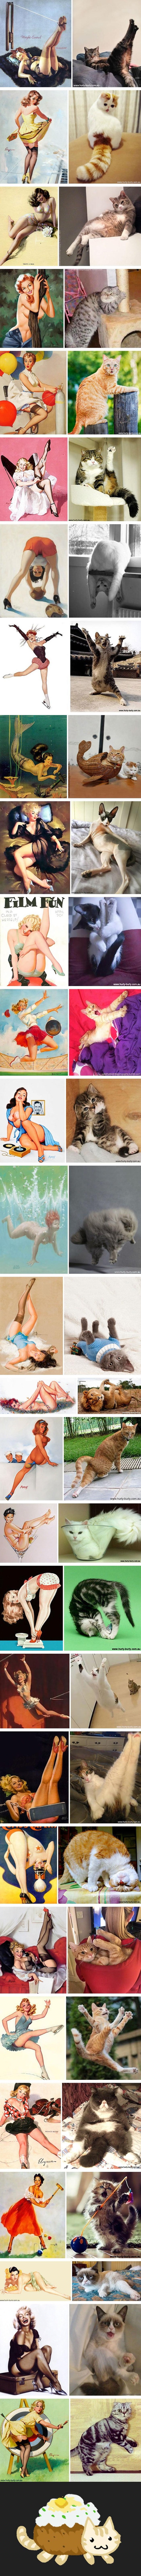 29 Cats Posing Like Pin Up Girls